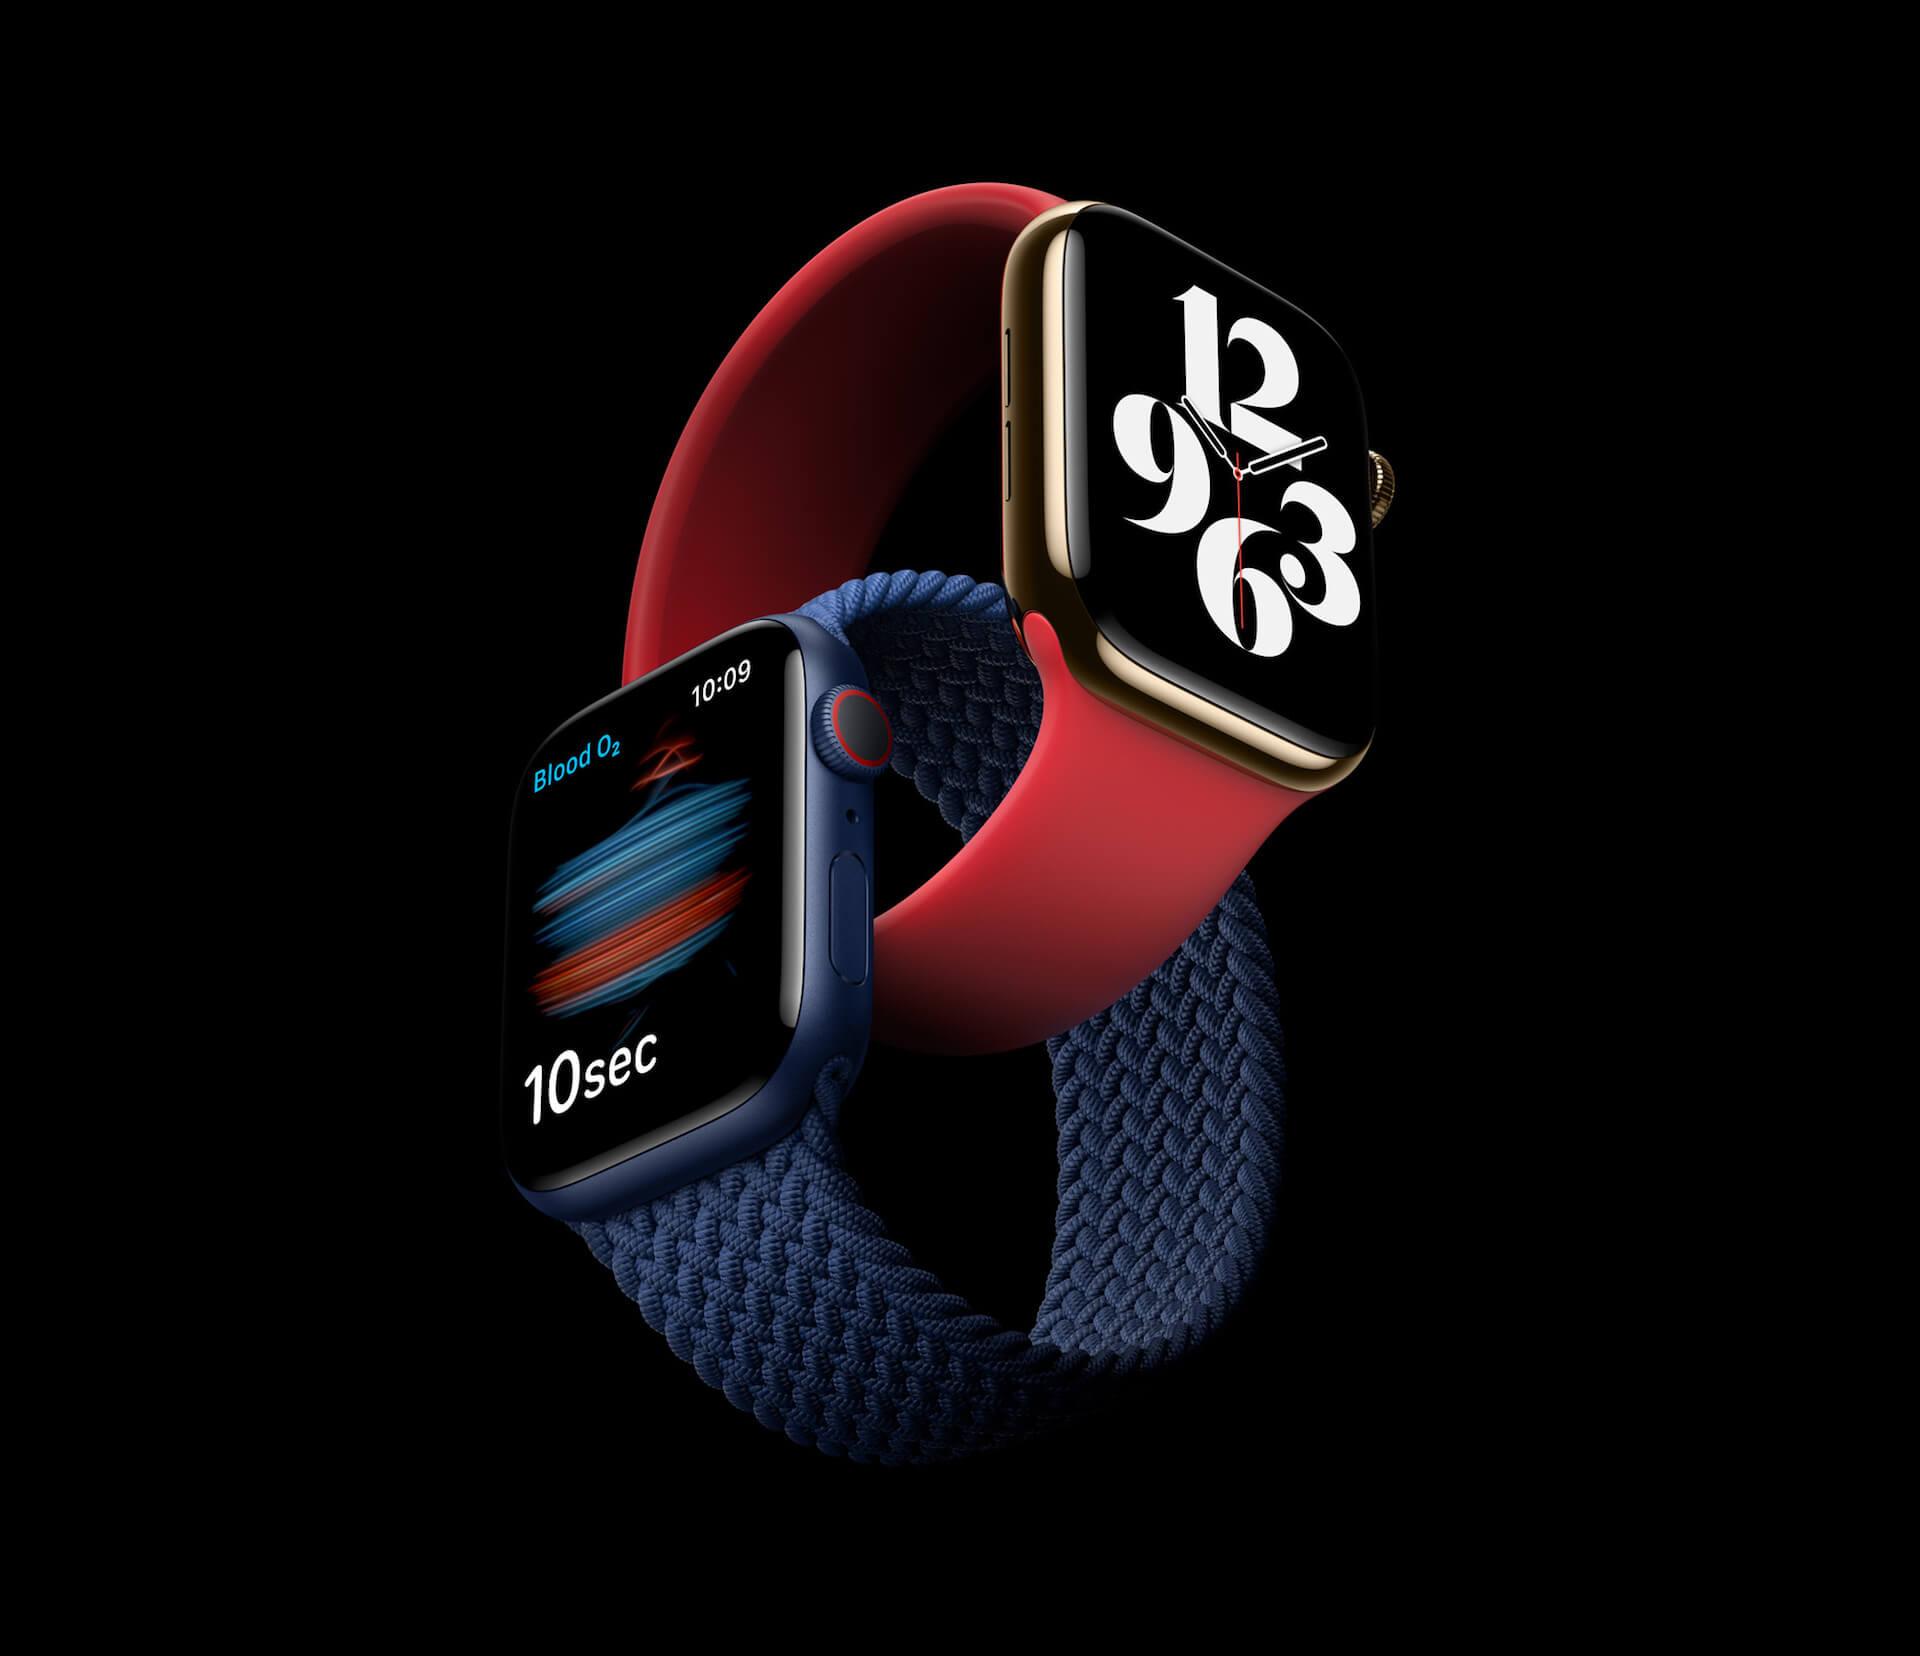 Apple Watch Series 6&Apple Watch SEがついに発表!ソロループや血中酸素濃度センサーなど新要素が追加 tech200916_applewatch_main